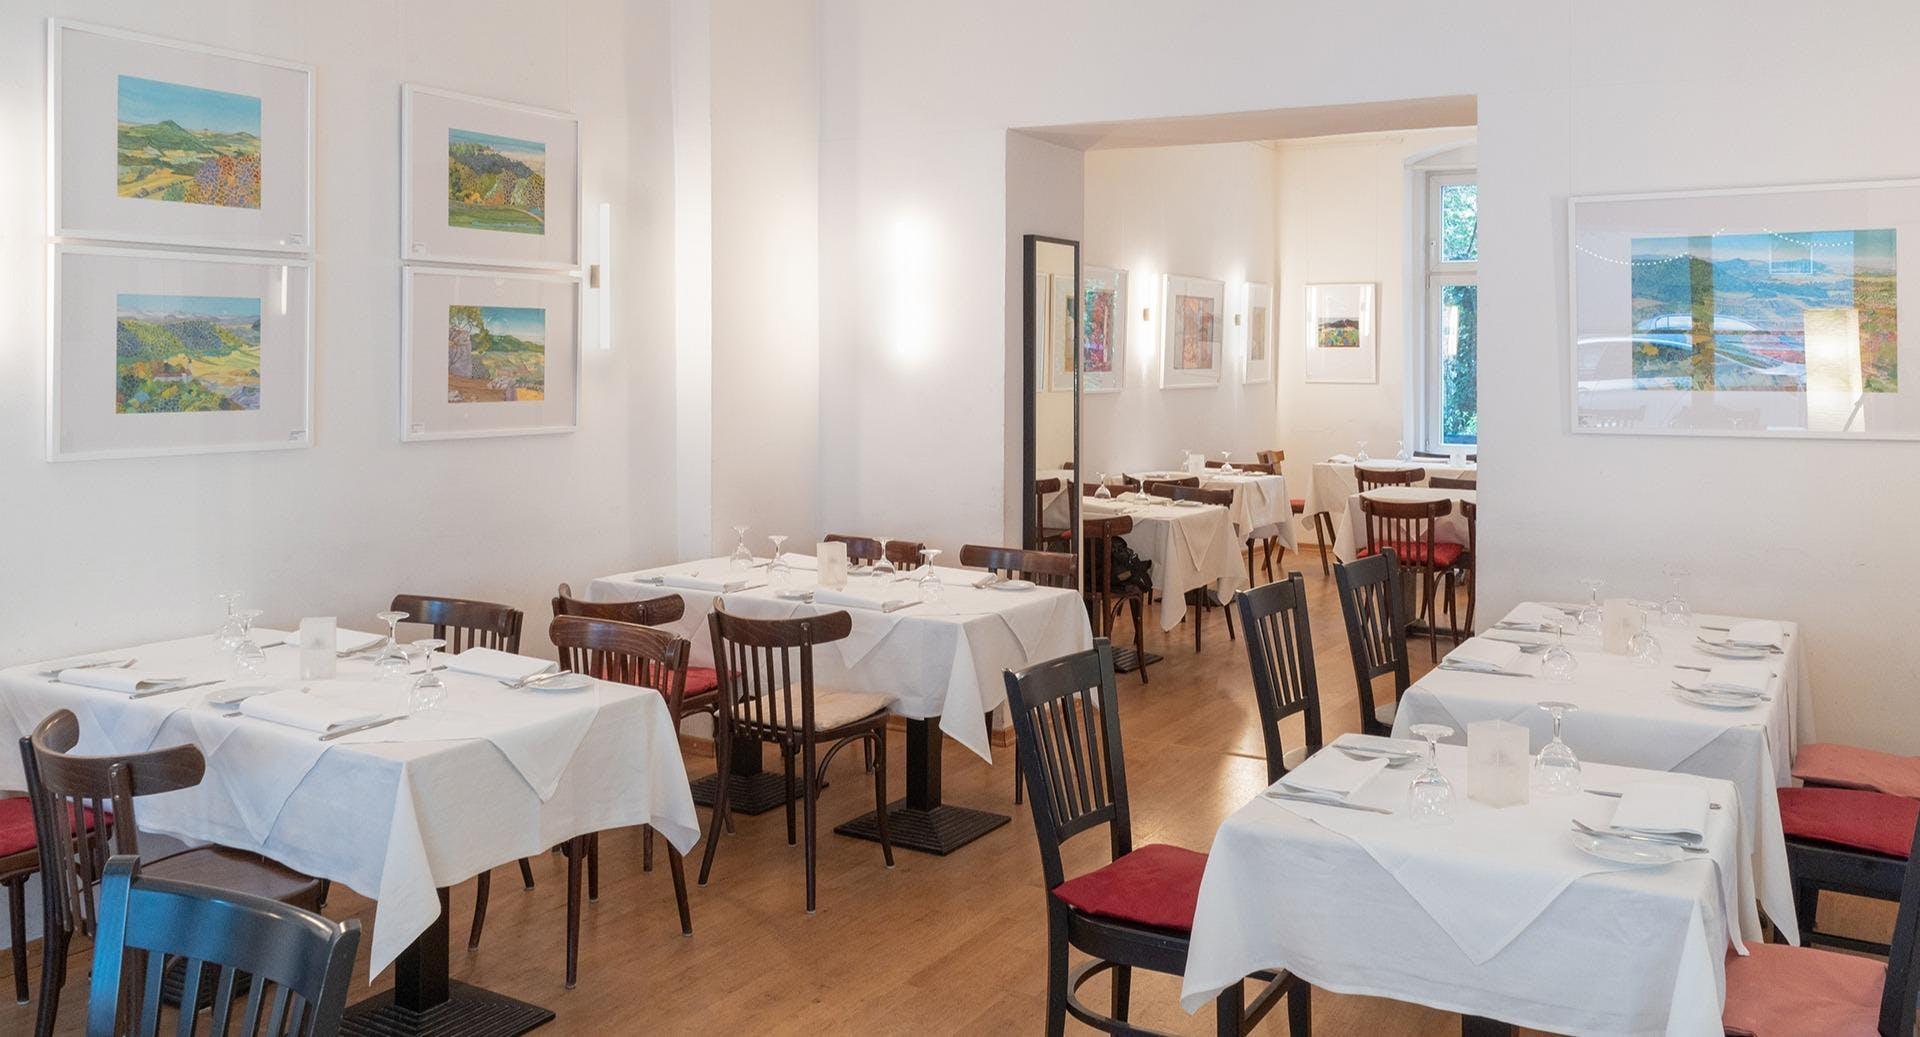 Restaurant Weiss Berlin image 3